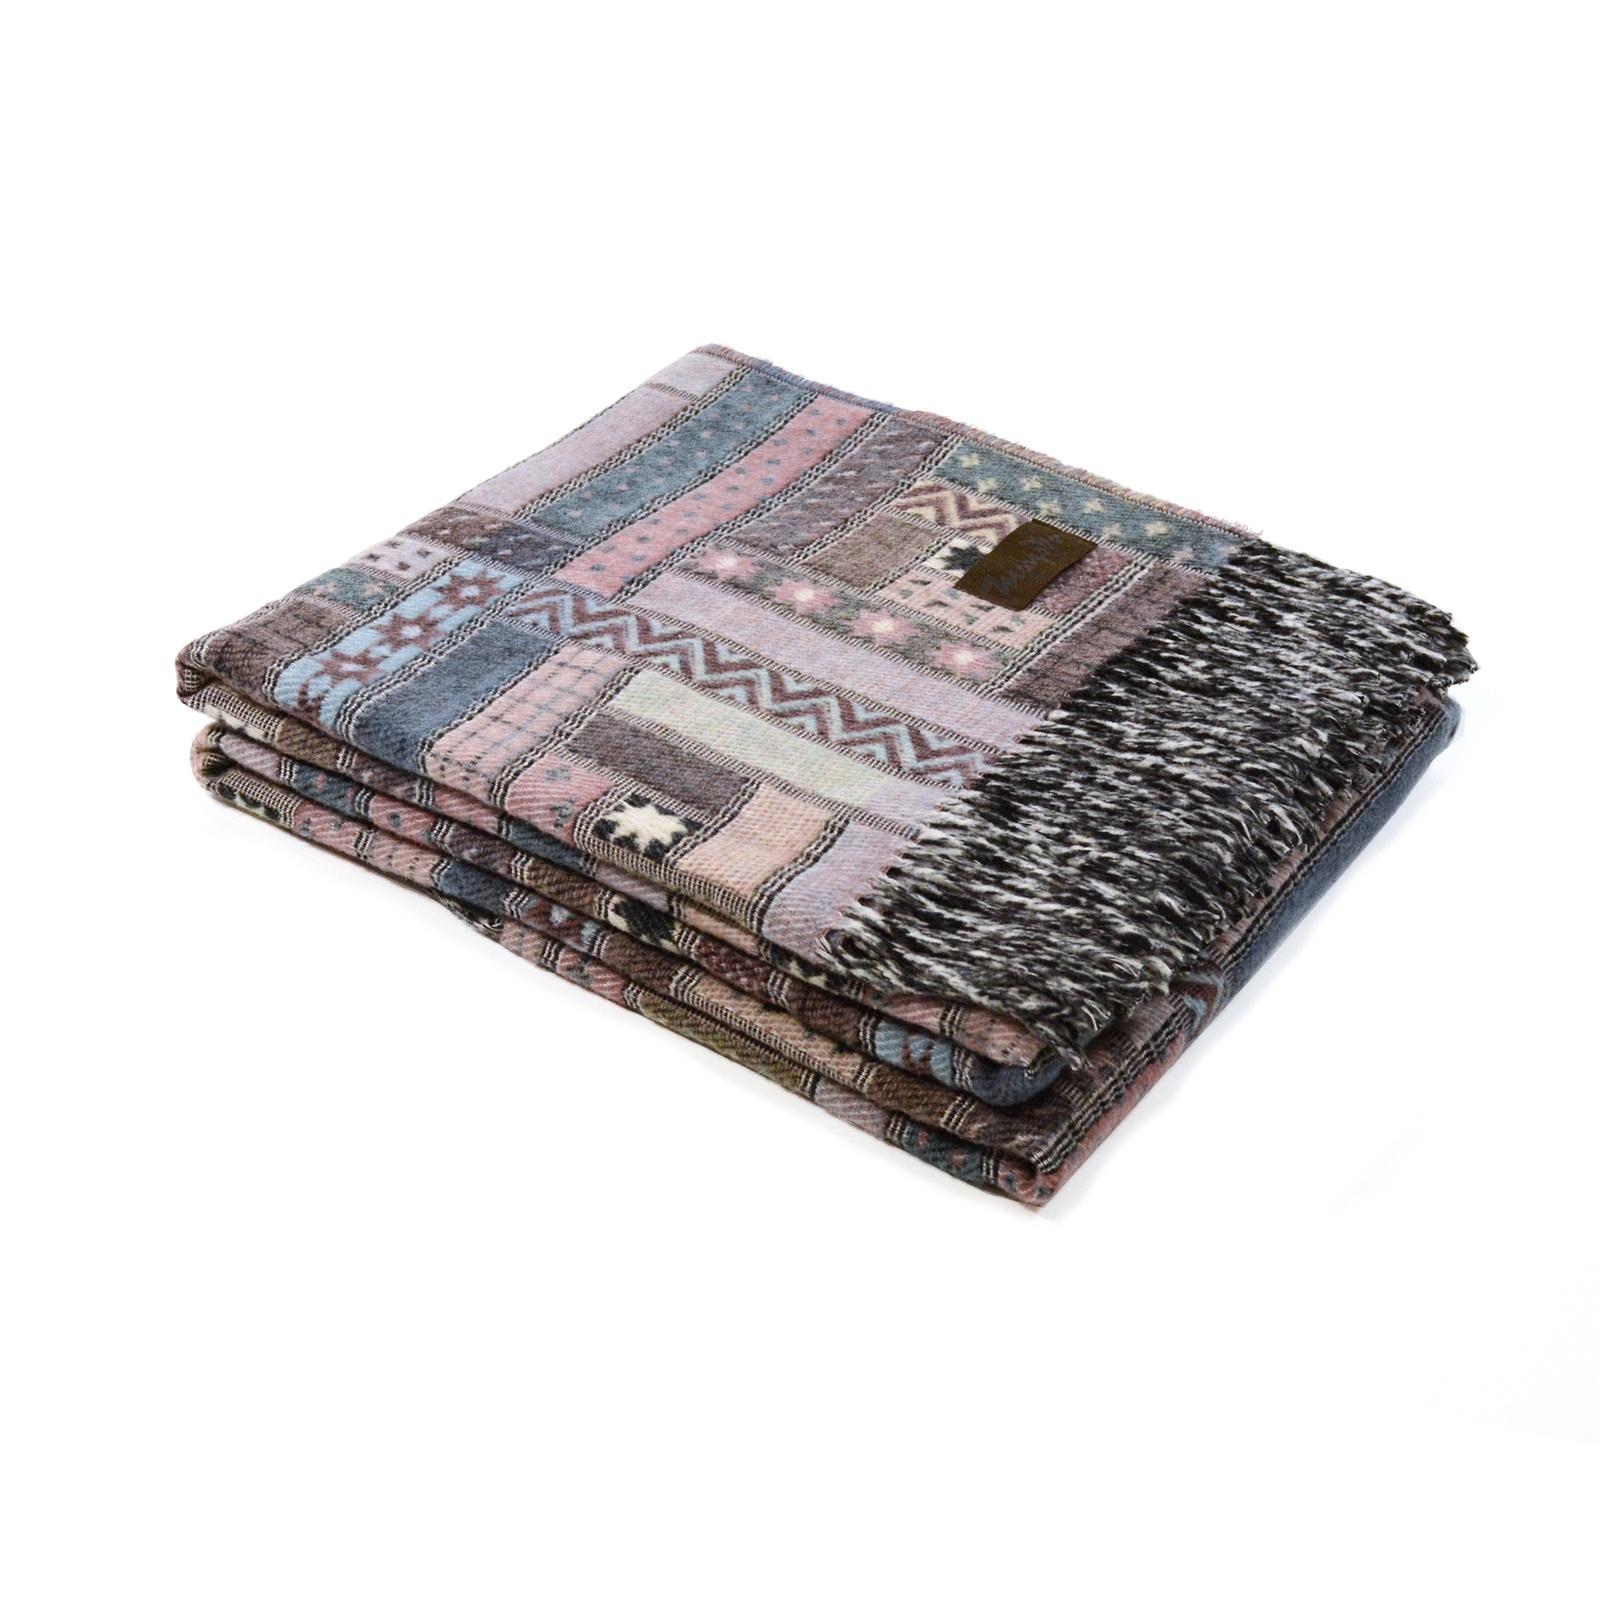 Плед MARZOTTO BALTIMORA, 9070, мультиколор плед marzotto paola 130х170 см